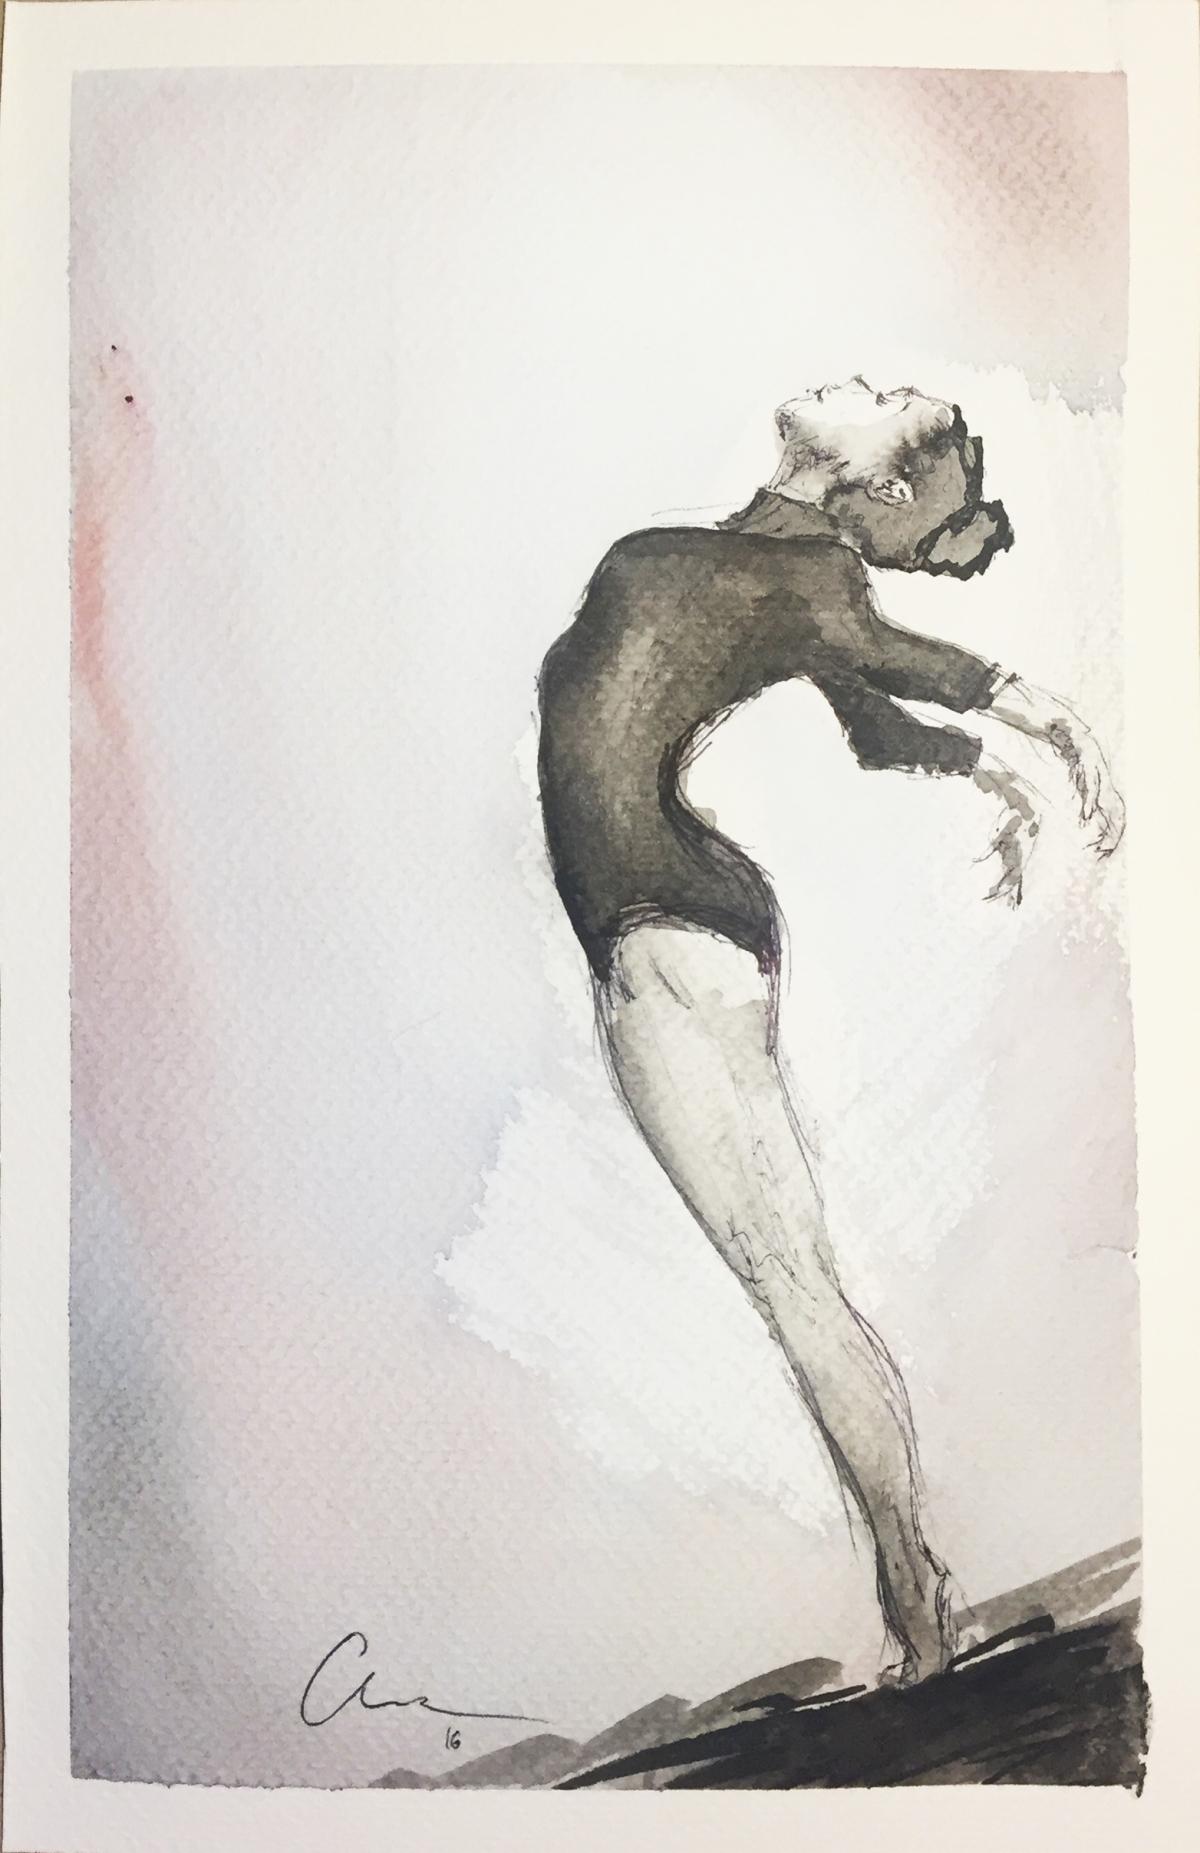 Bailarina Watercolor and pen.